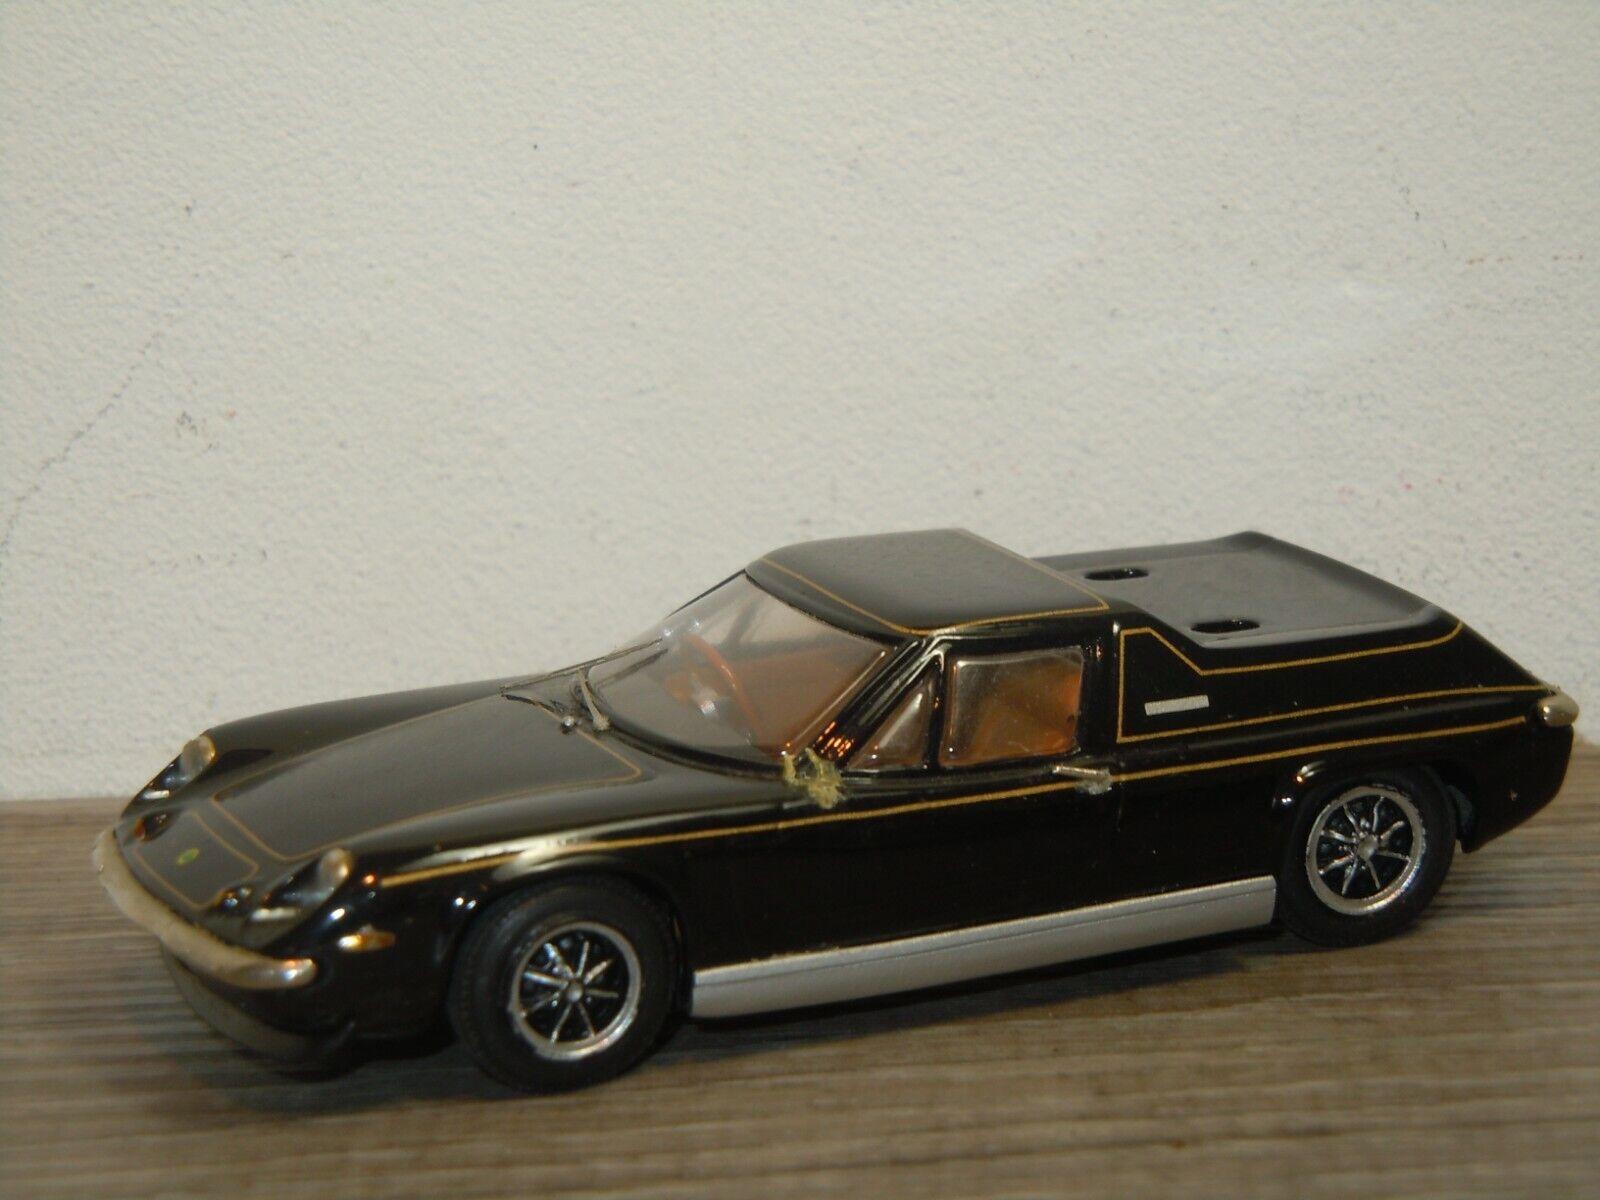 Lotus 47 Europa - The Racing Line by SMTS 8 England 1 43 37139